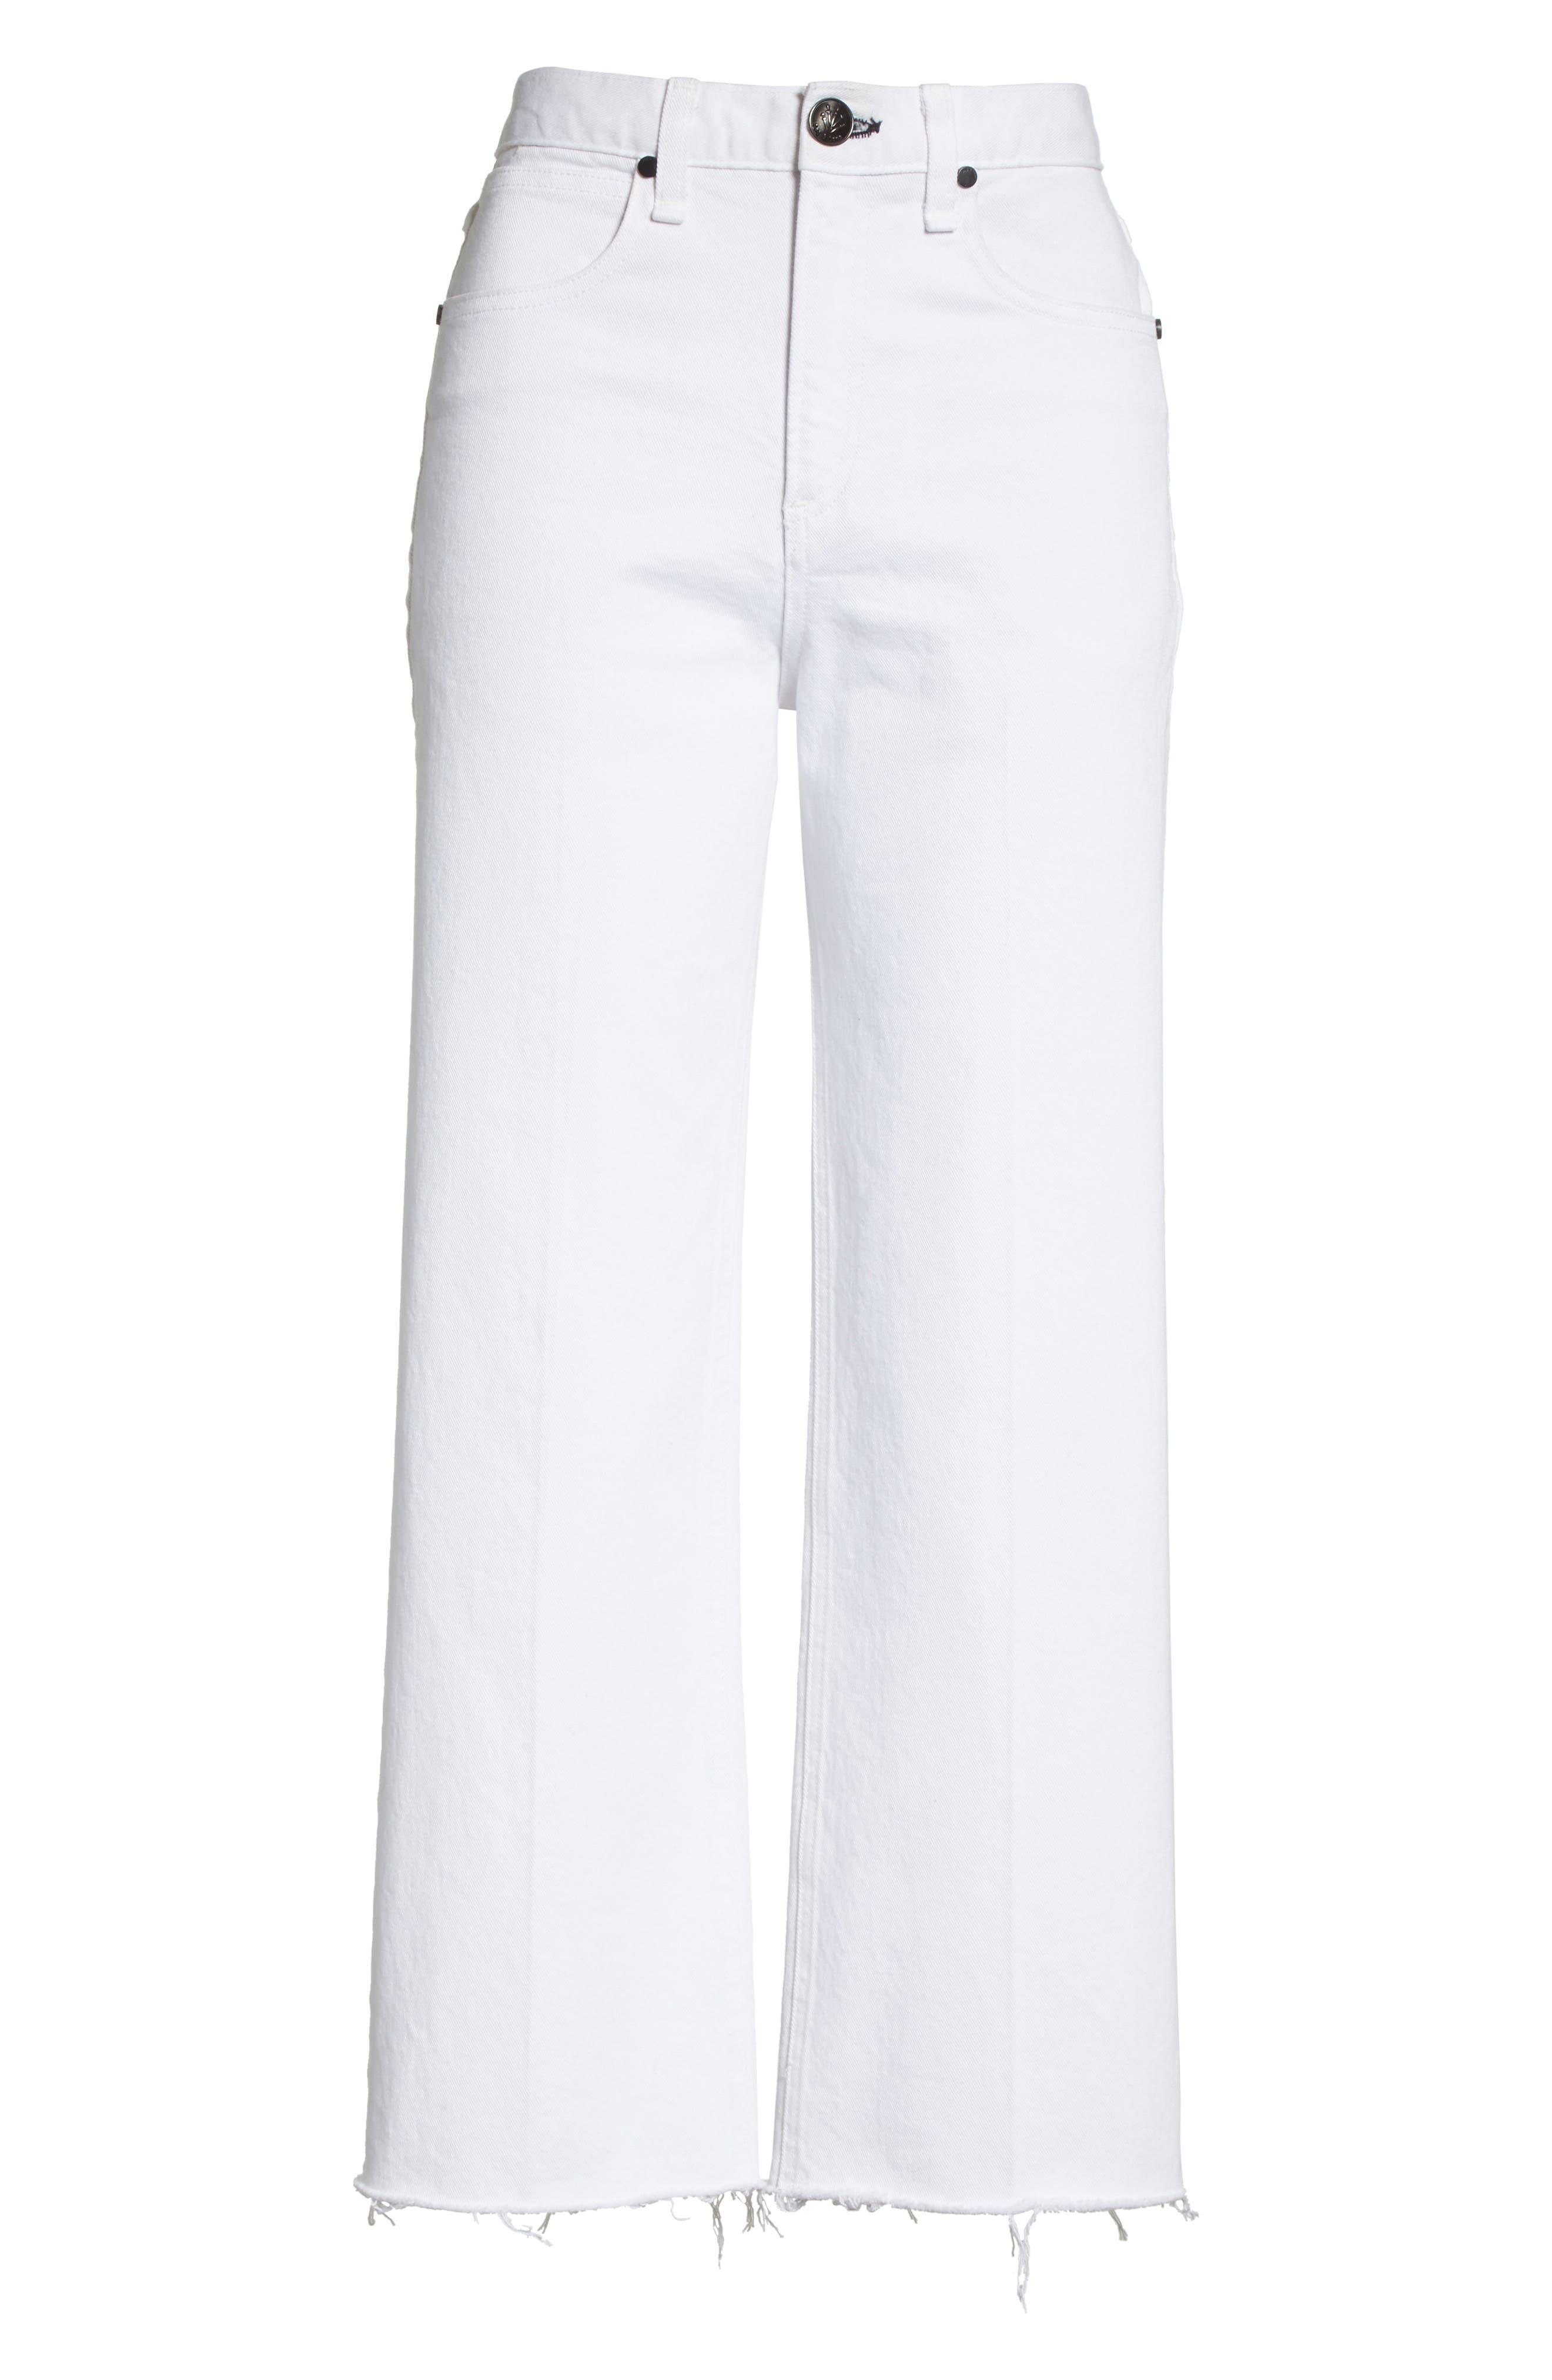 Justine High Waist Ankle Wide Leg Trouser Jeans,                             Alternate thumbnail 6, color,                             100